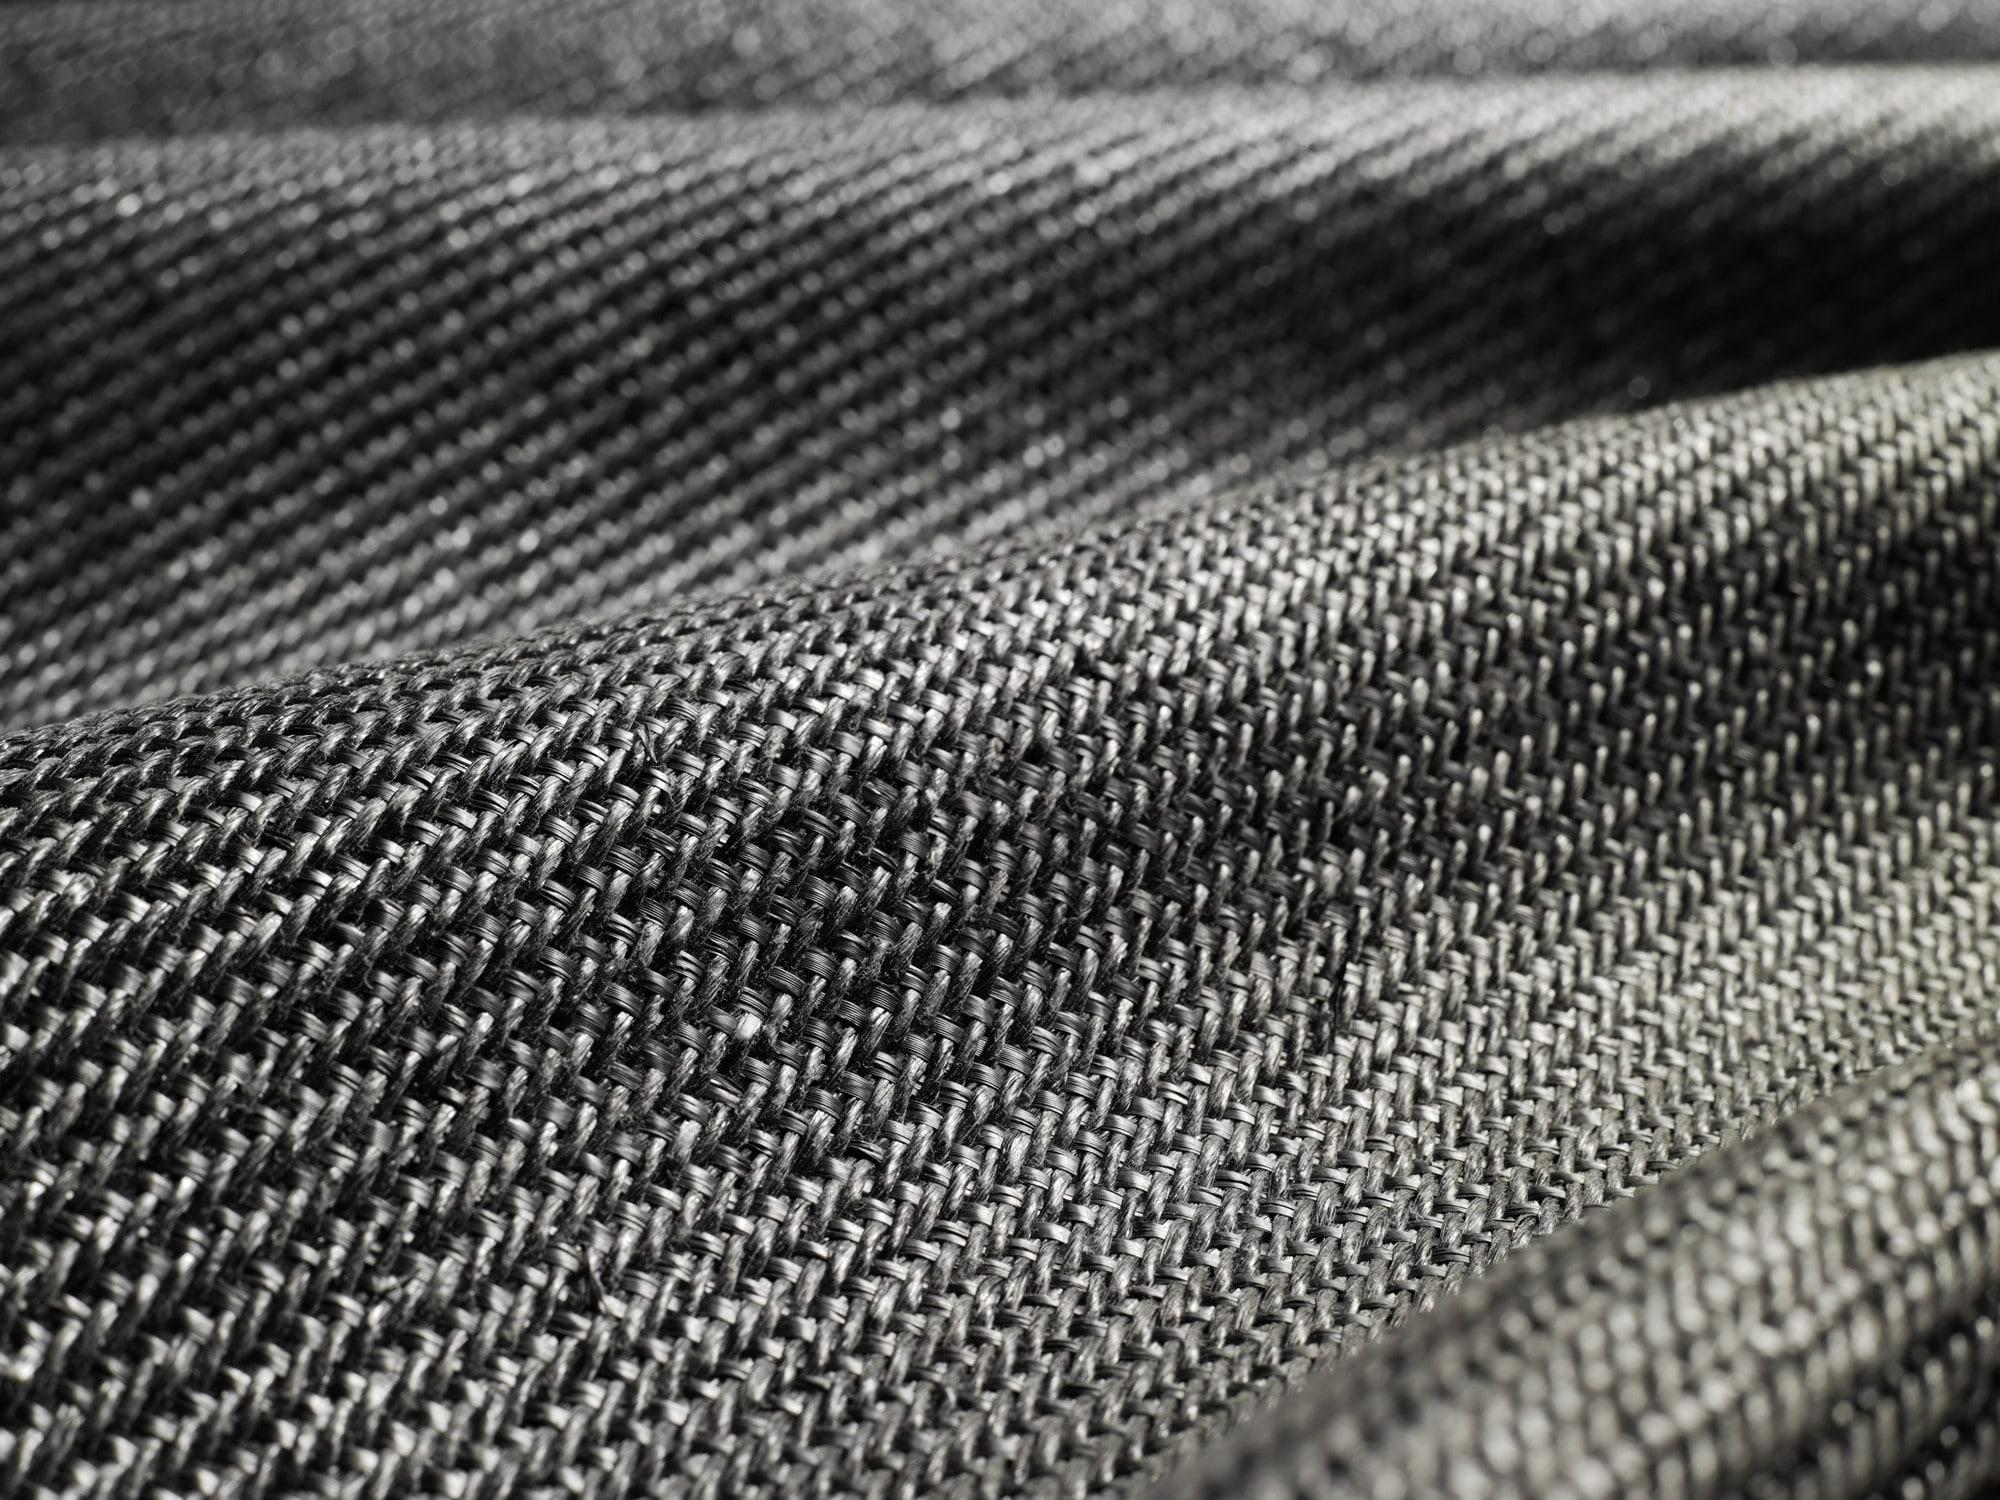 Materiales Geosintéticos - TenCate Geolon PP